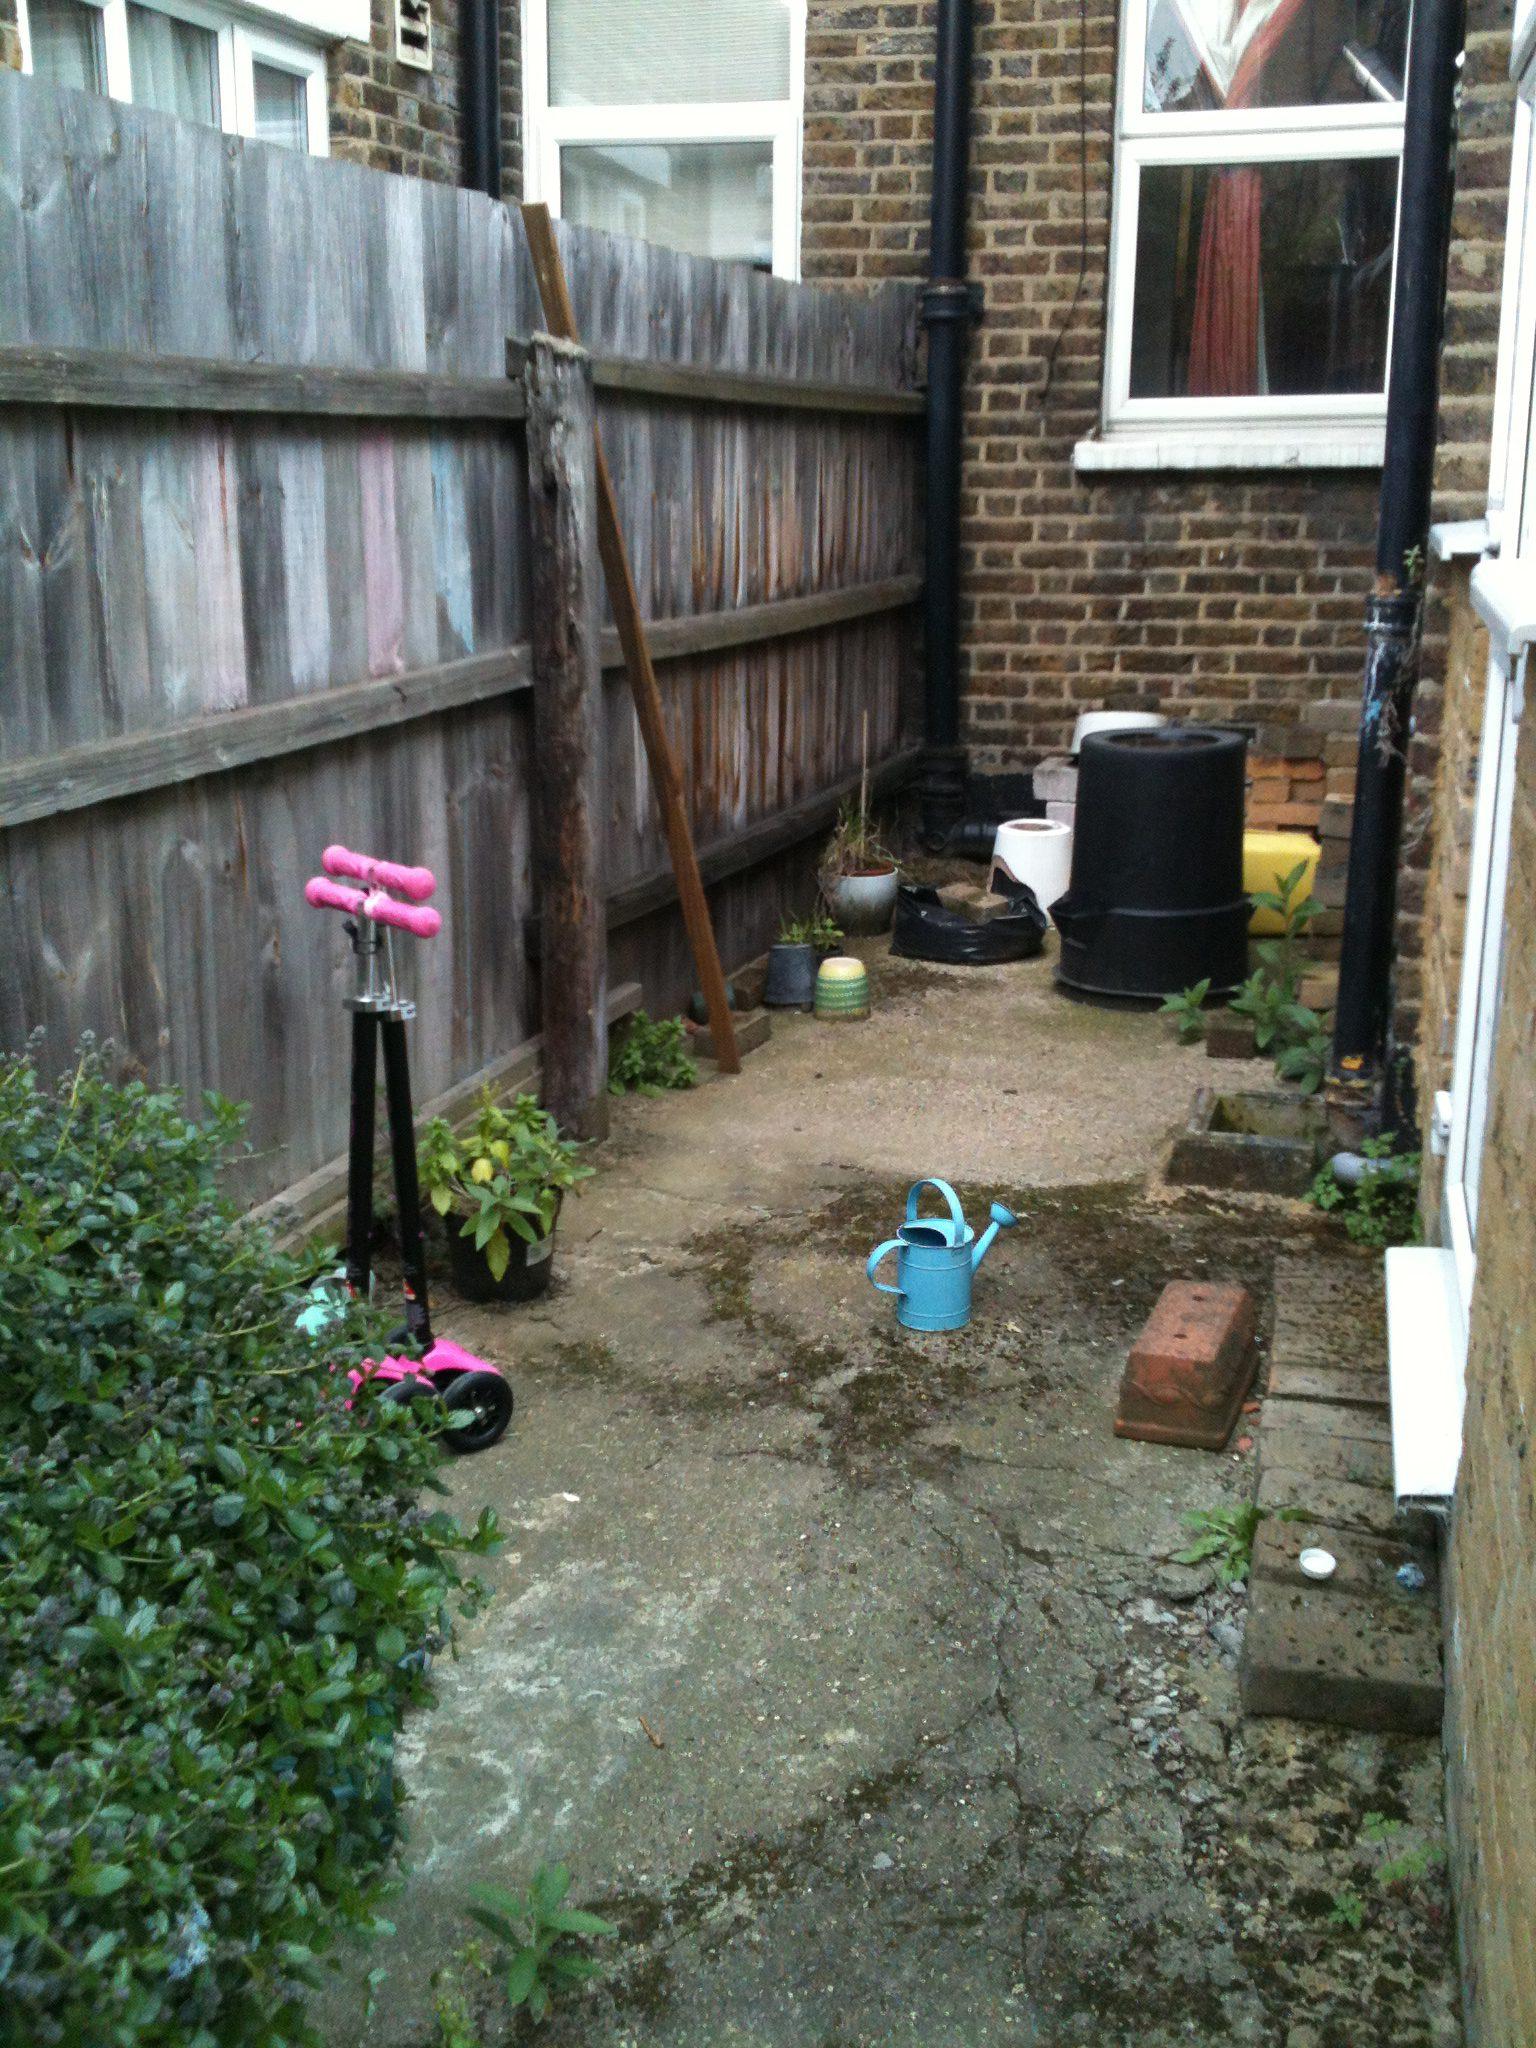 Small Garden Design on a budget - Walthamstow garden packs ... on Landscape Garden Designs For Small Gardens id=95493